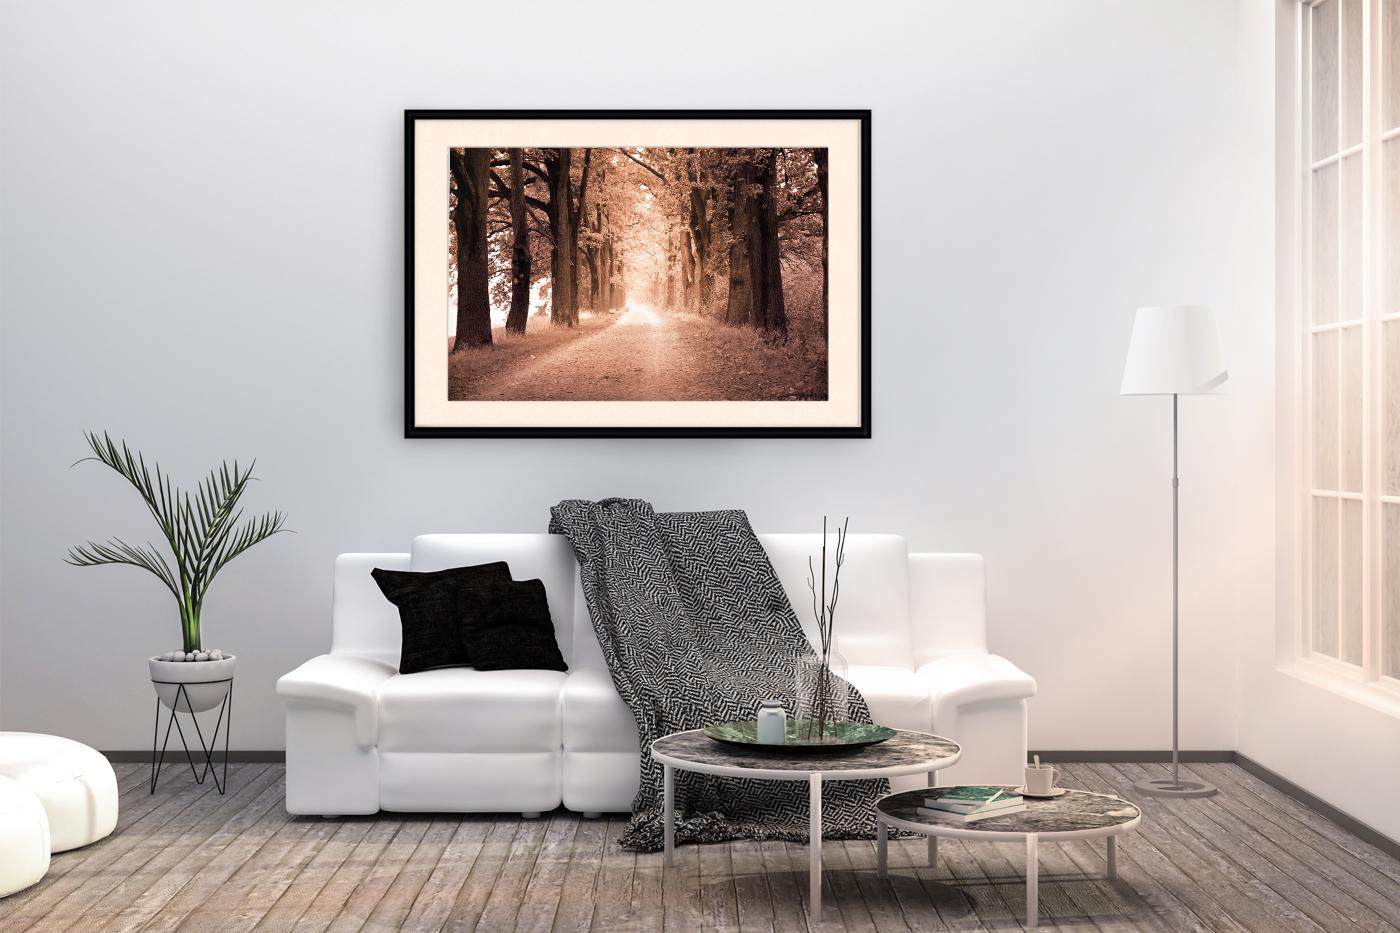 Nature photo, landscape photo, autumn alley photo, example image 5